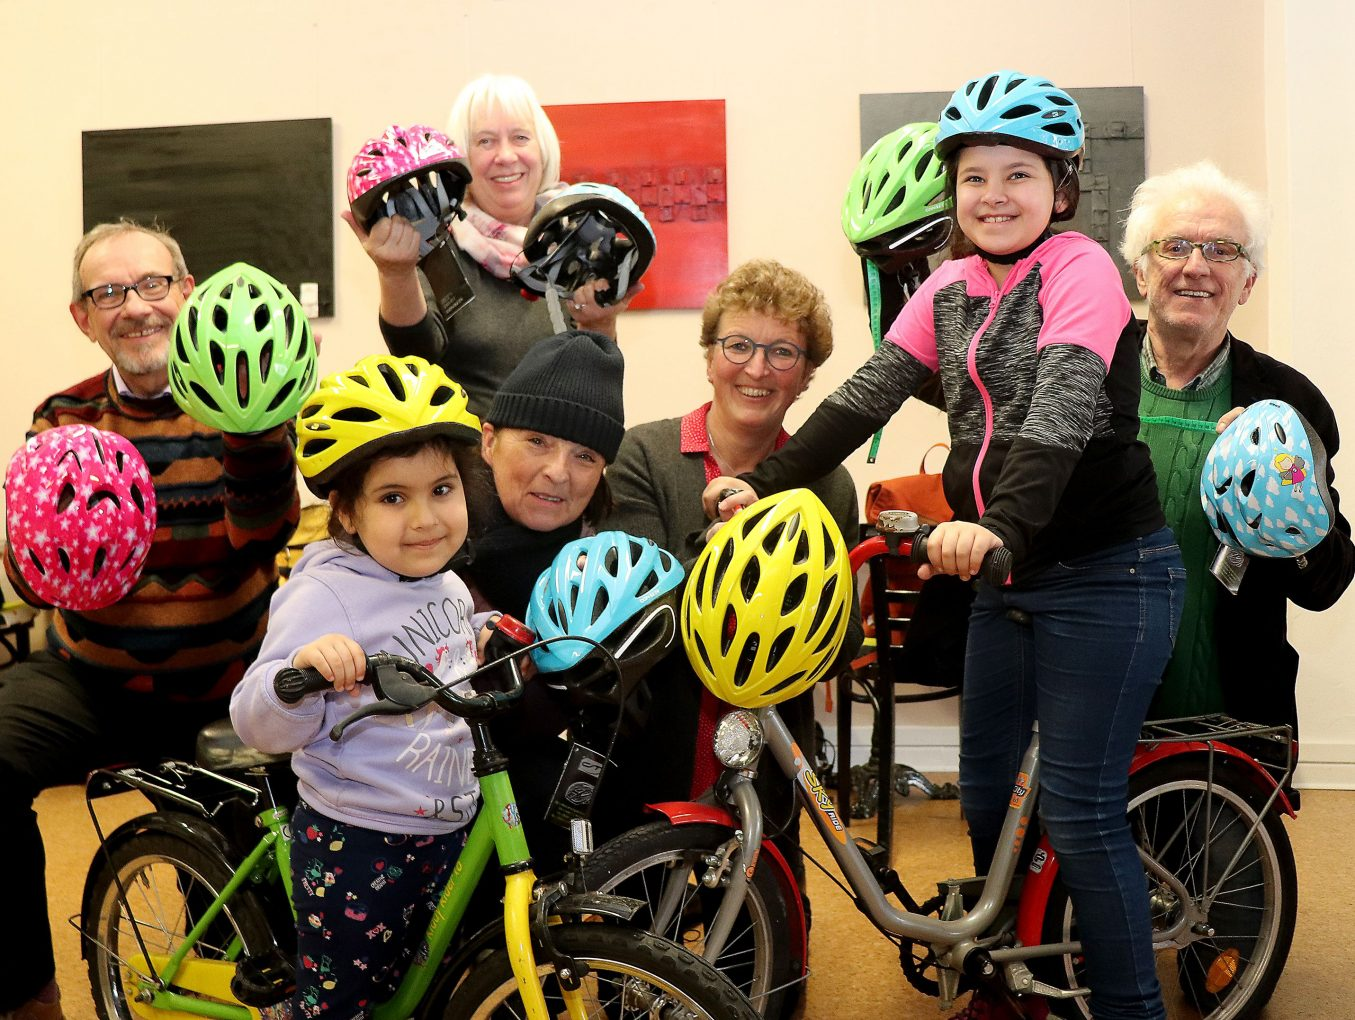 Flüchtlingshilfe: Bürgerstiftung spendiert Fahrradhelme